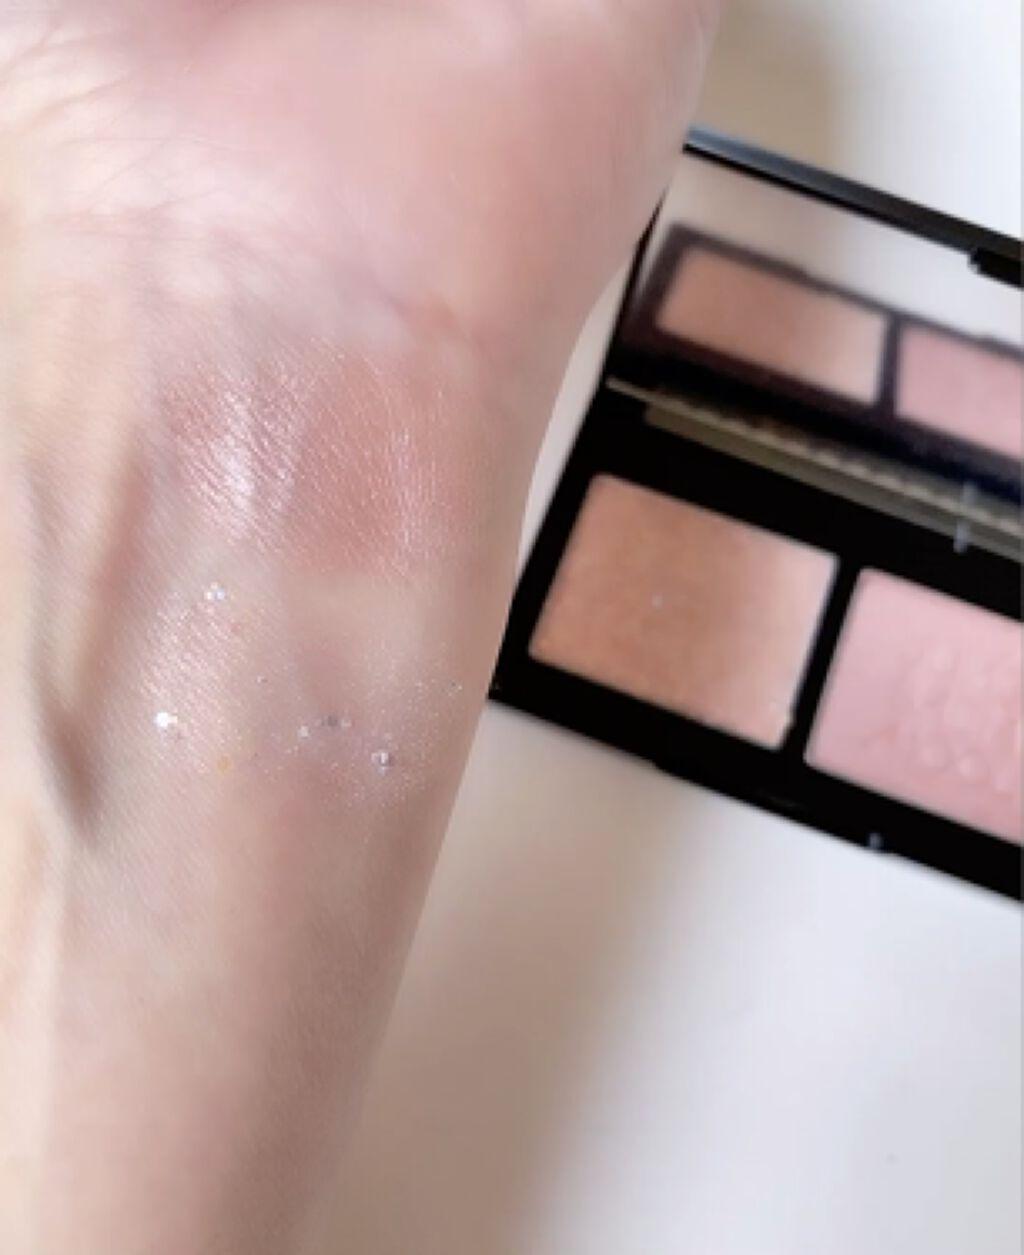 Refining Eyeshadow Double/JUNG SAEM MOOL/パウダーアイシャドウを使ったクチコミ(4枚目)